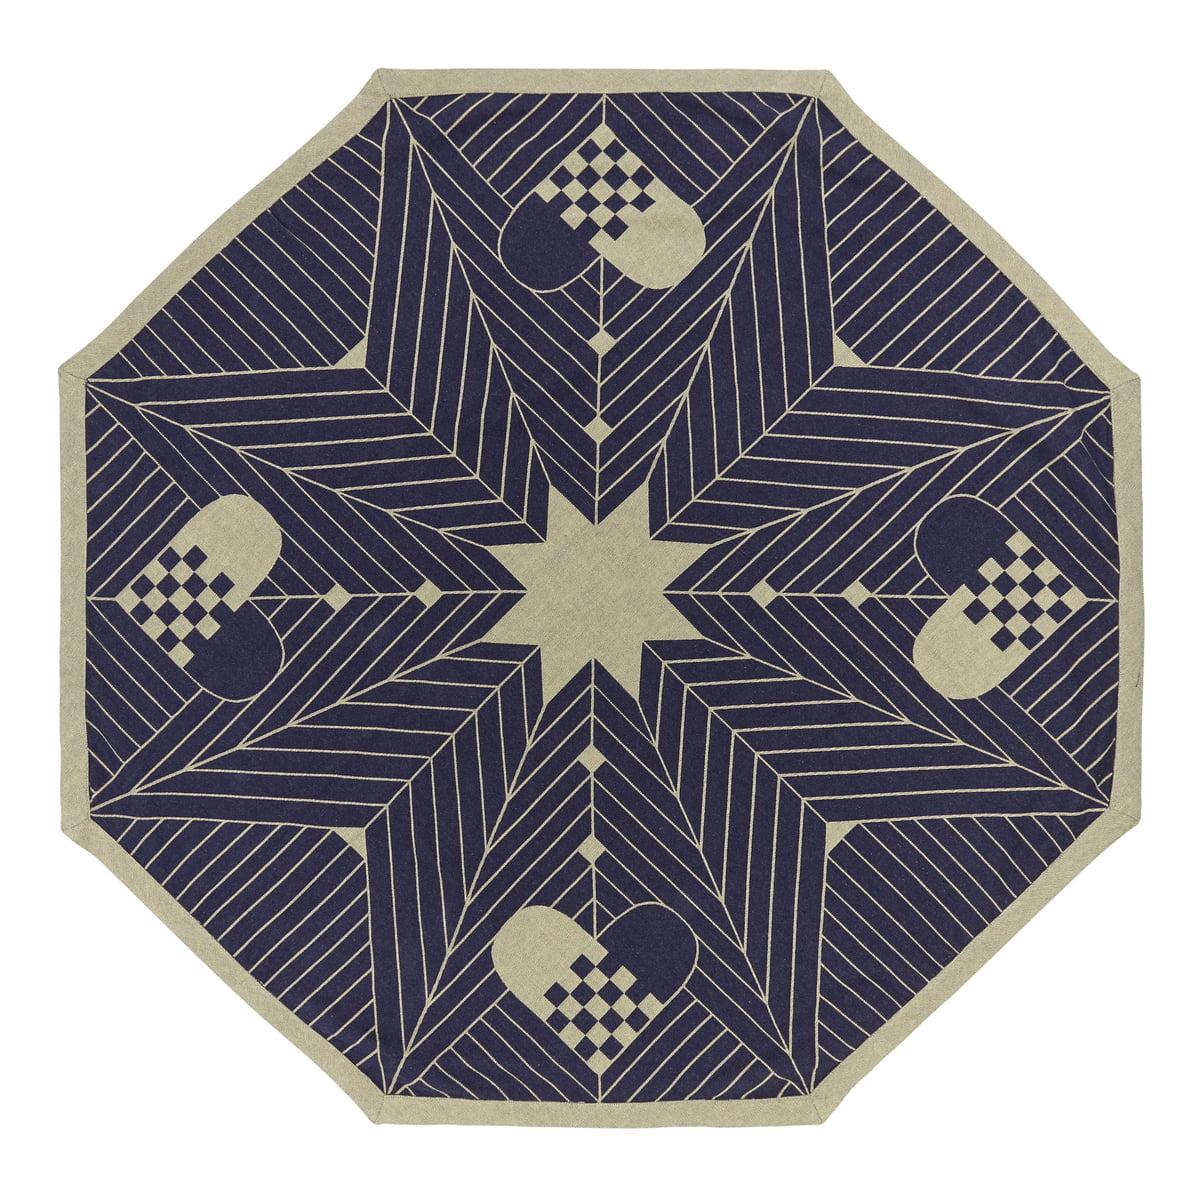 tapis sapin de no l octagon georg jensen. Black Bedroom Furniture Sets. Home Design Ideas